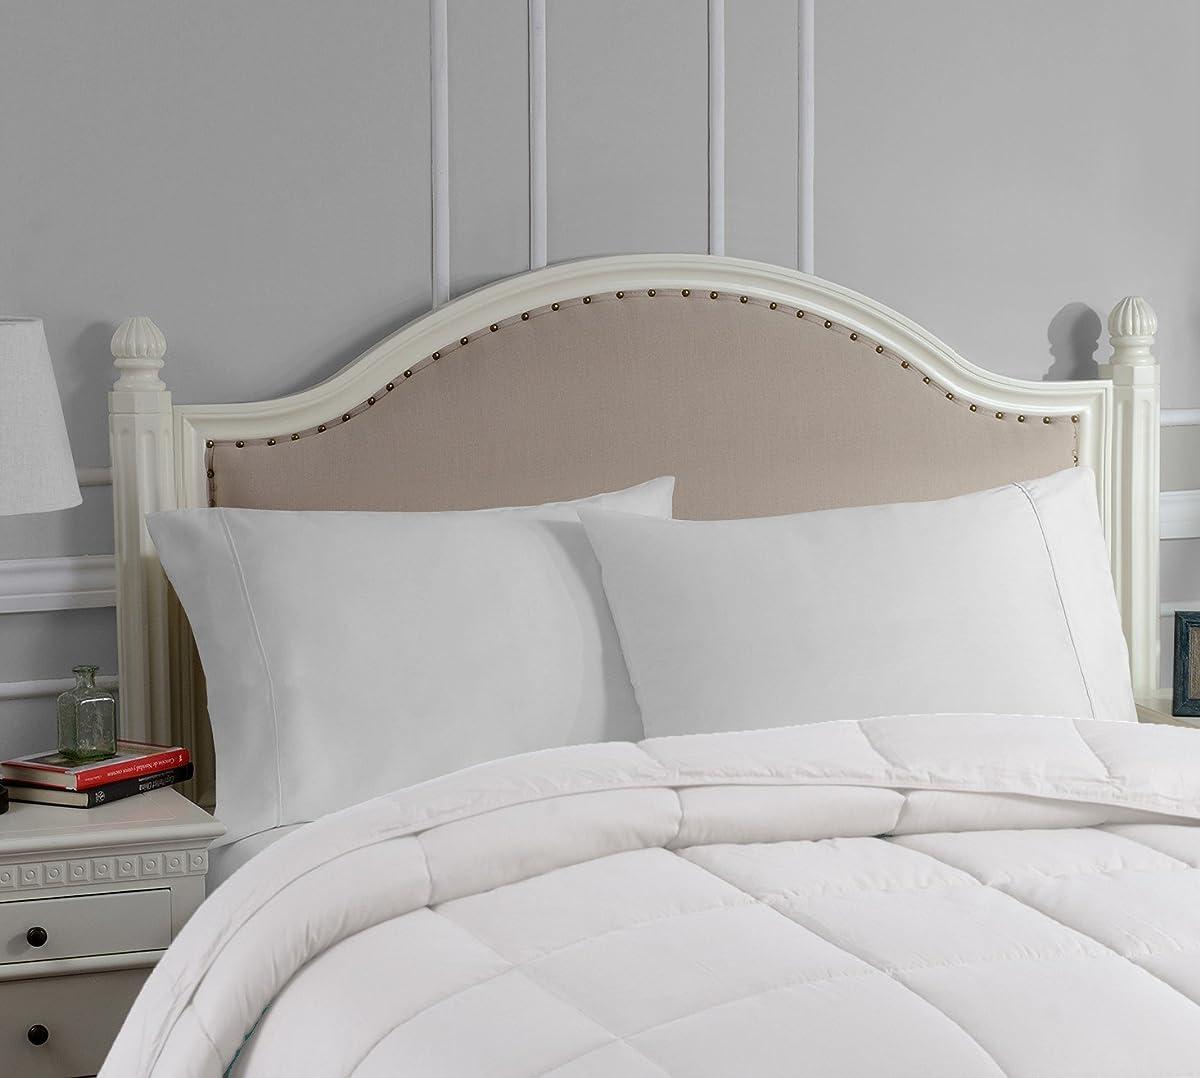 Superior White Down Alternative Pillow 2 Pack Premium